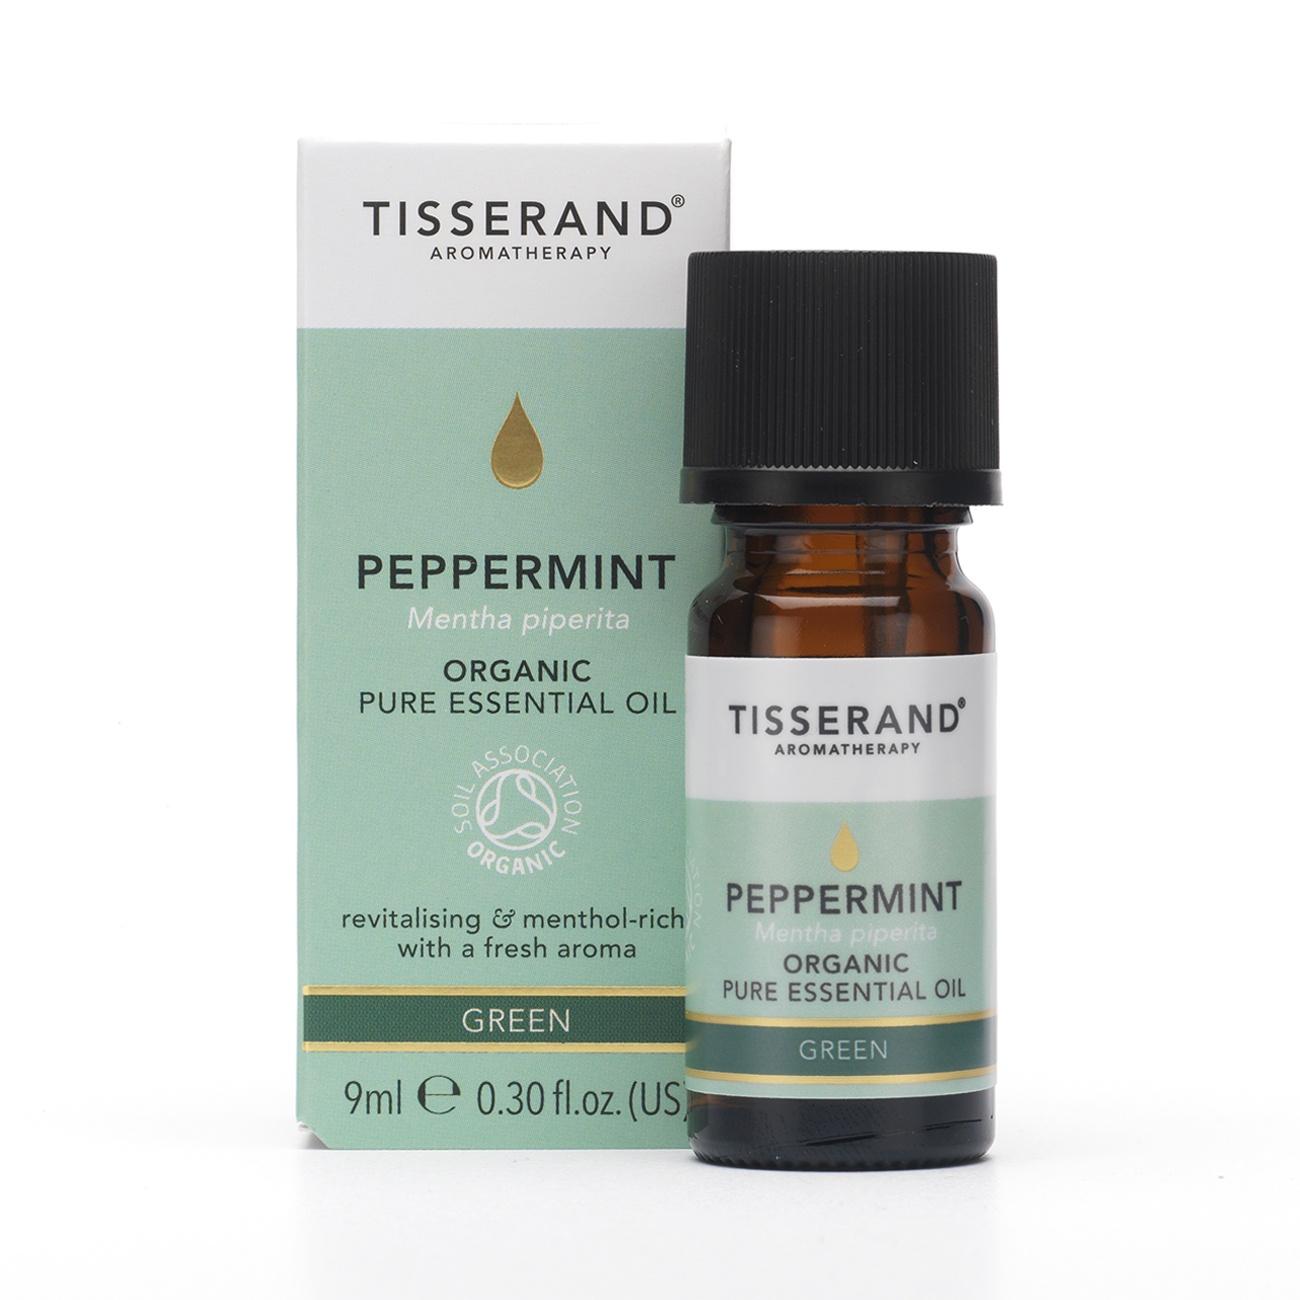 Tisserand Peppermint Organic Essential Oil 9ml